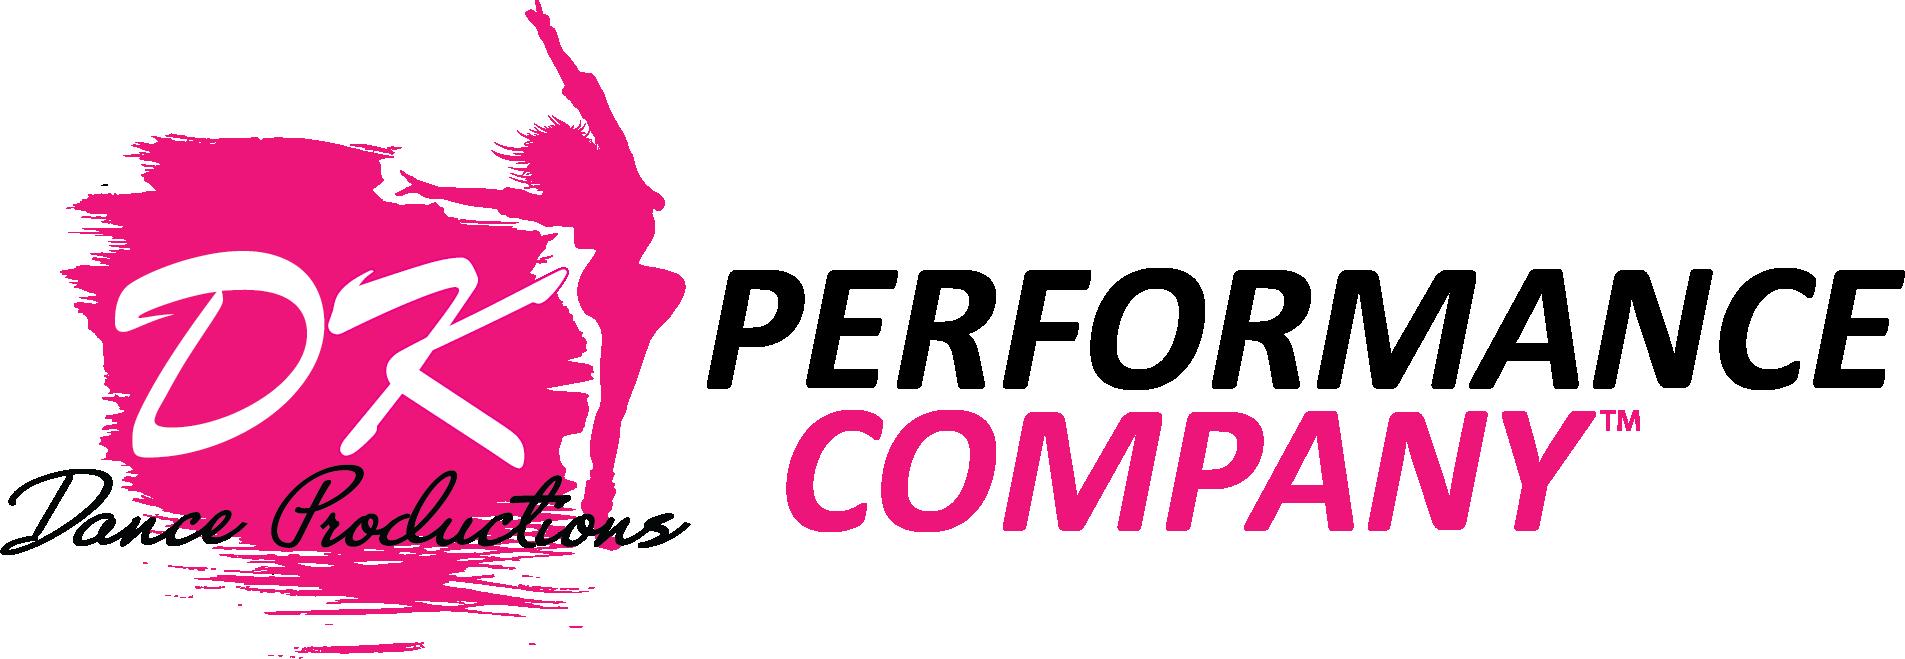 DK-Performance Co Logo